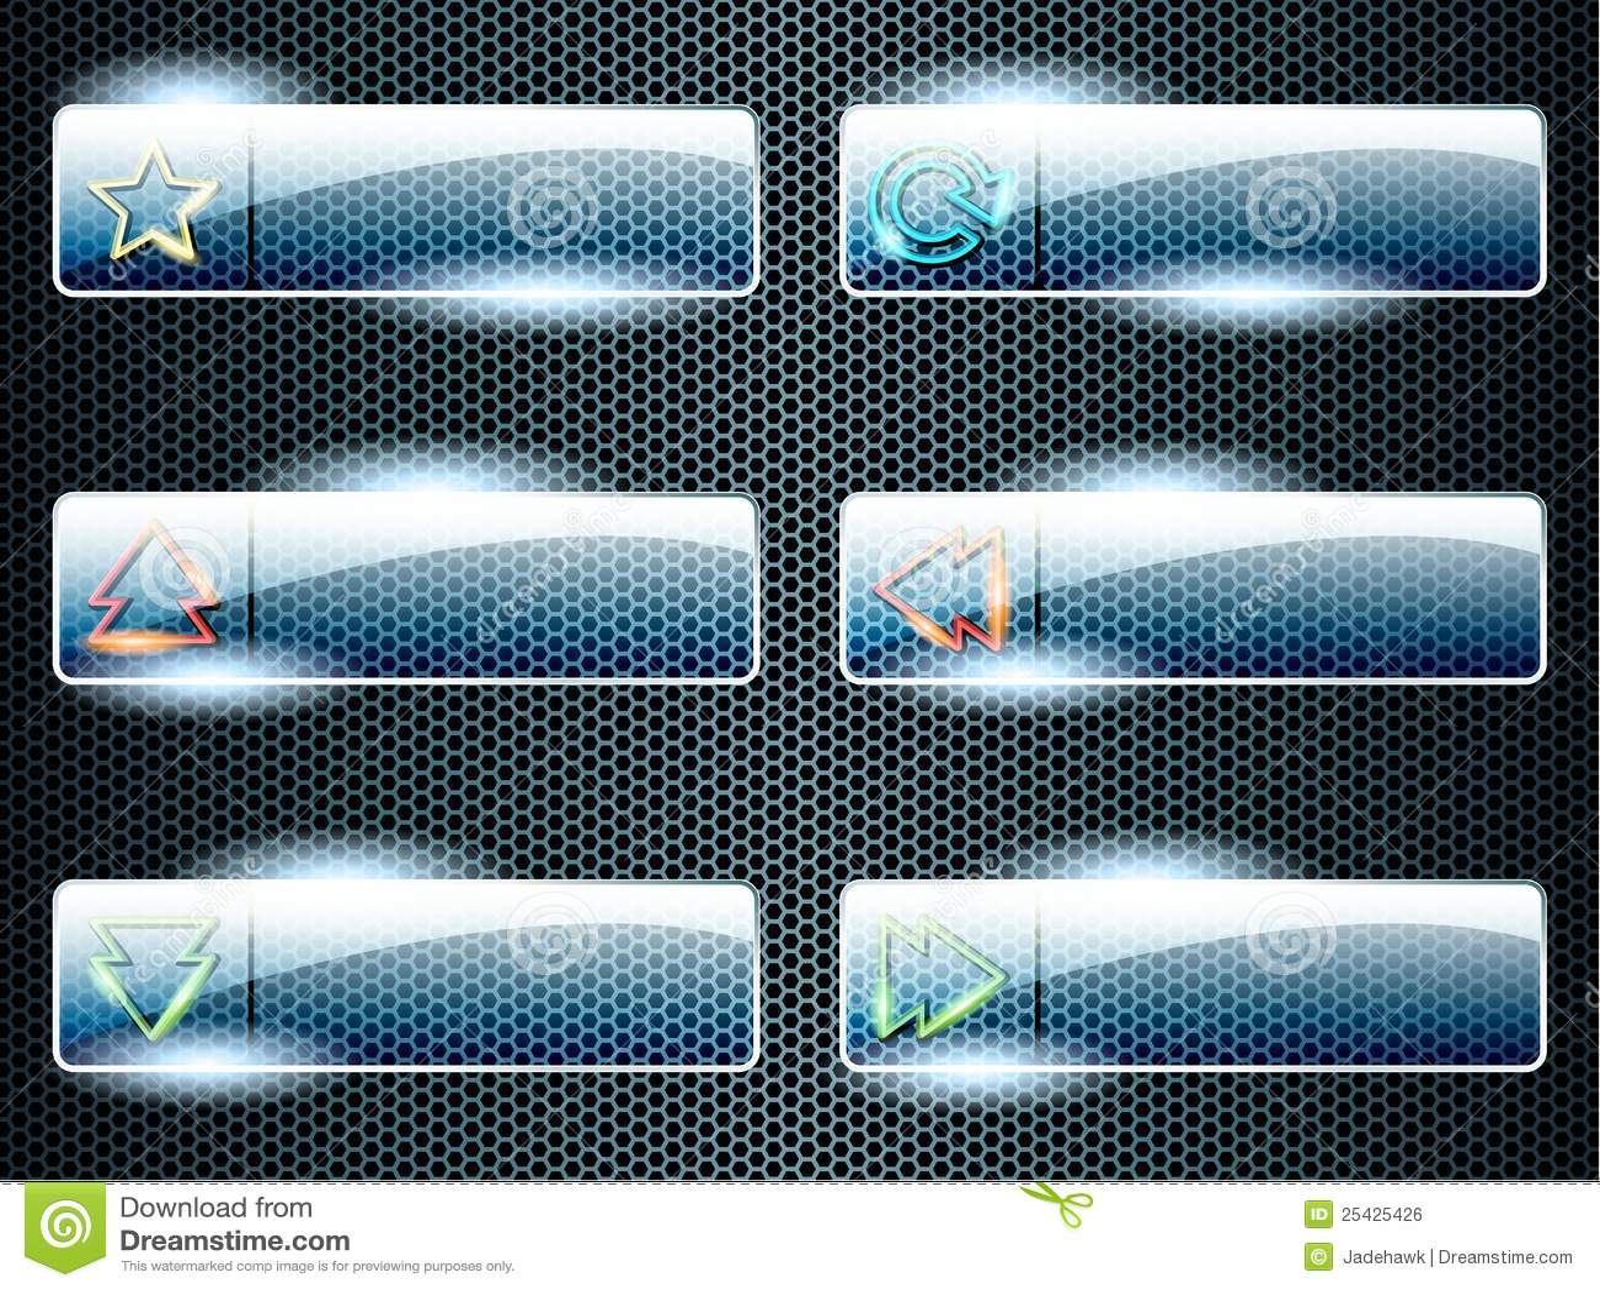 Rectangular transparent glass buttons